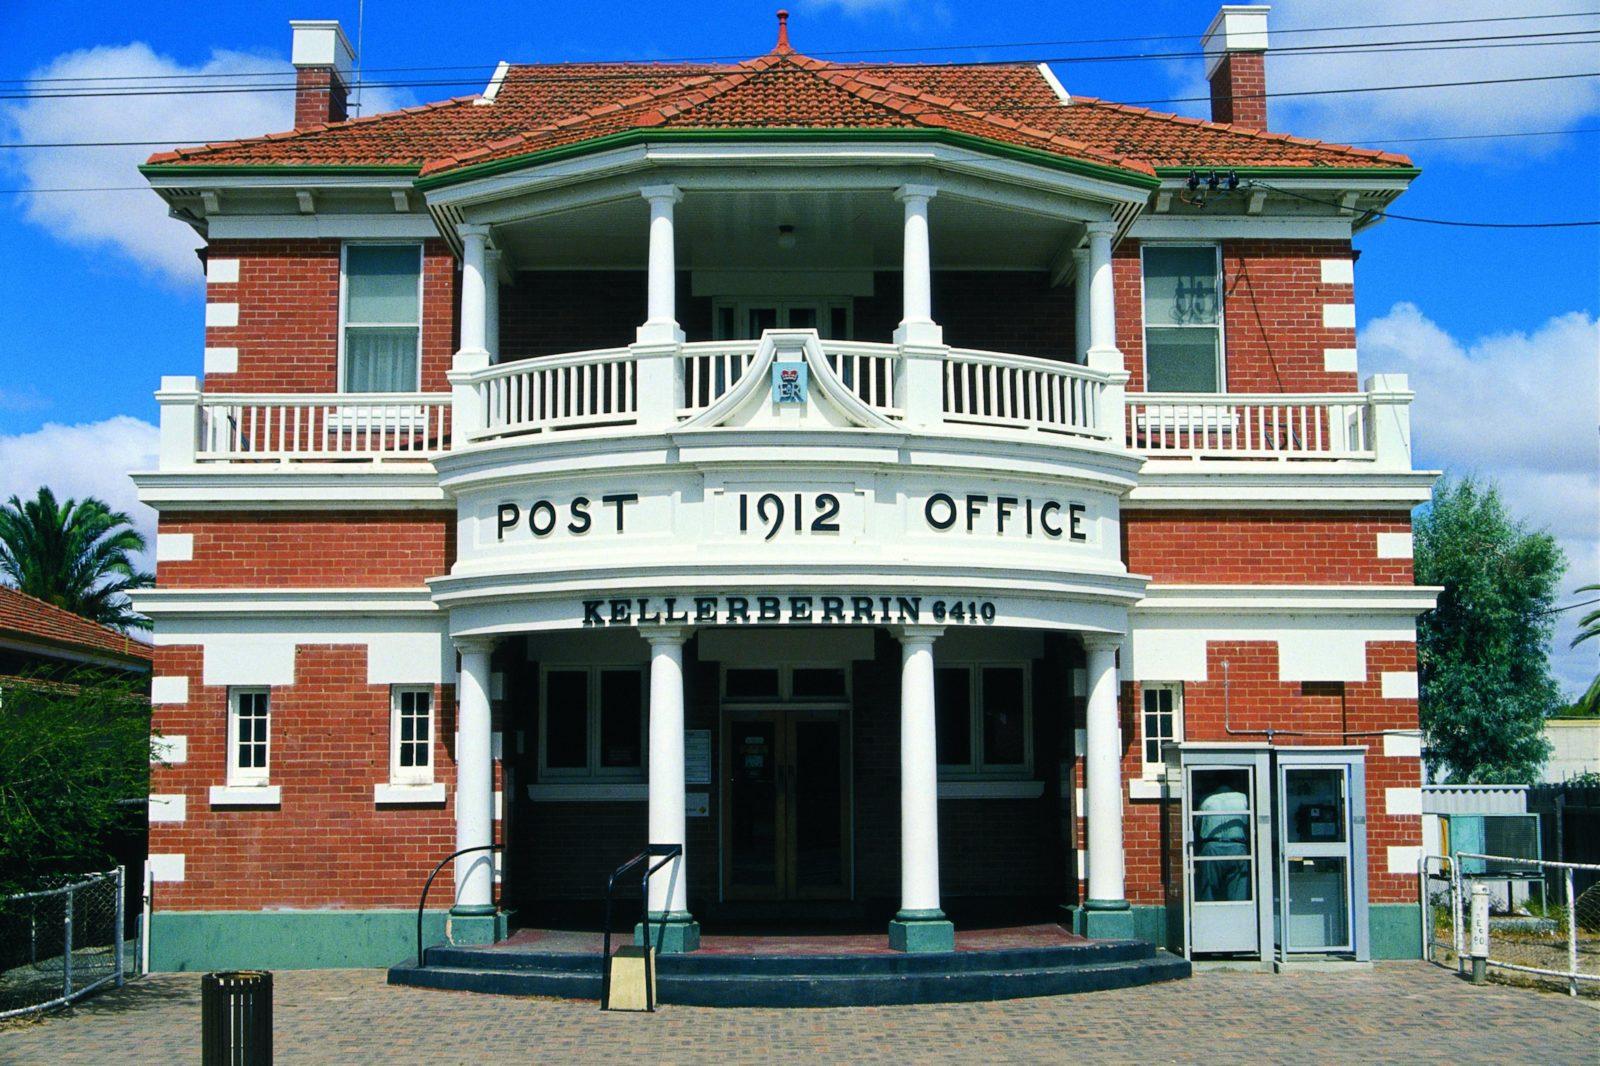 Kellerberrin, Western Australia